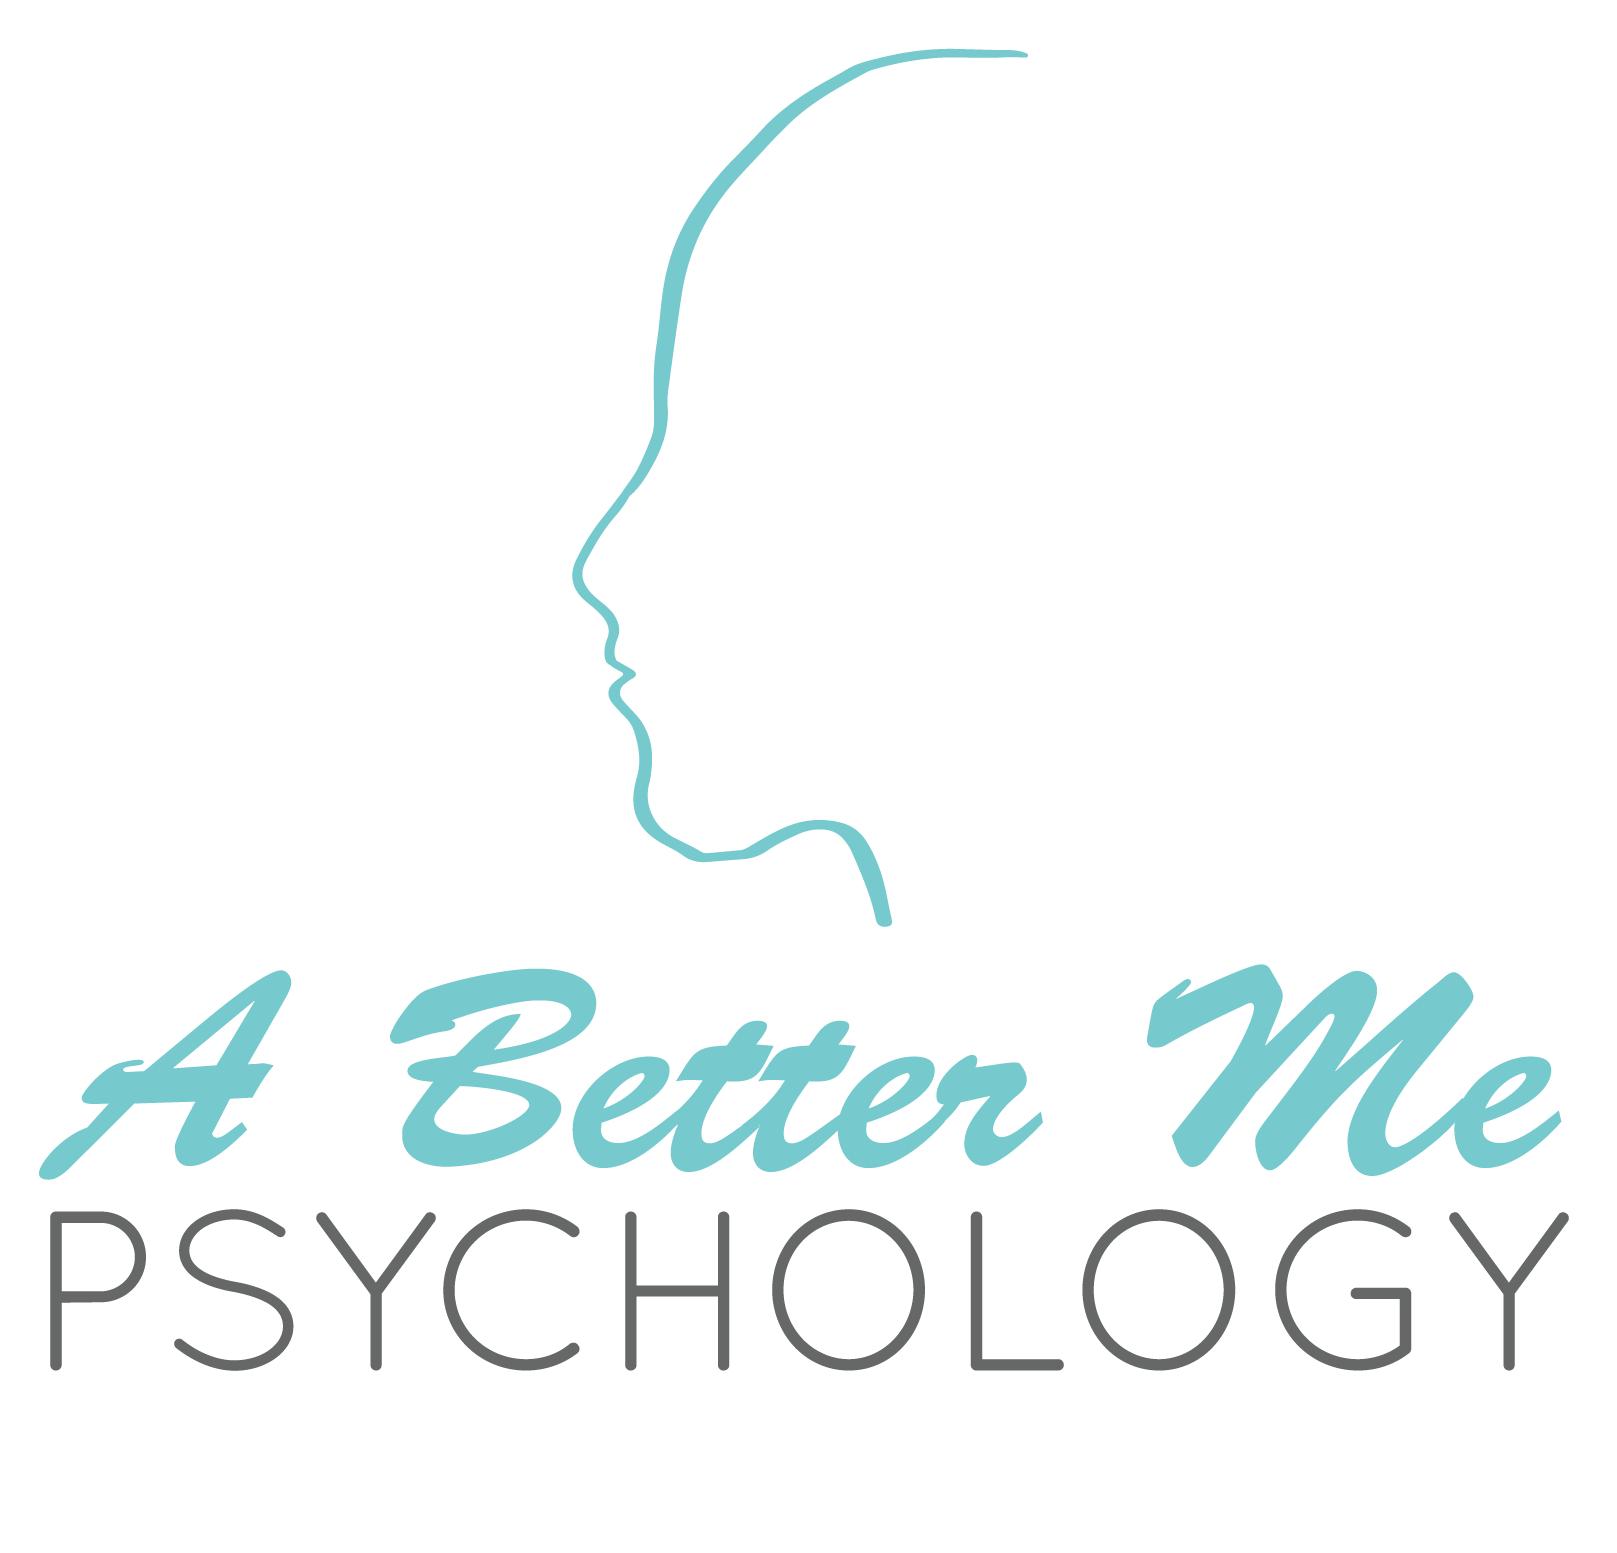 A Better Me Psychology